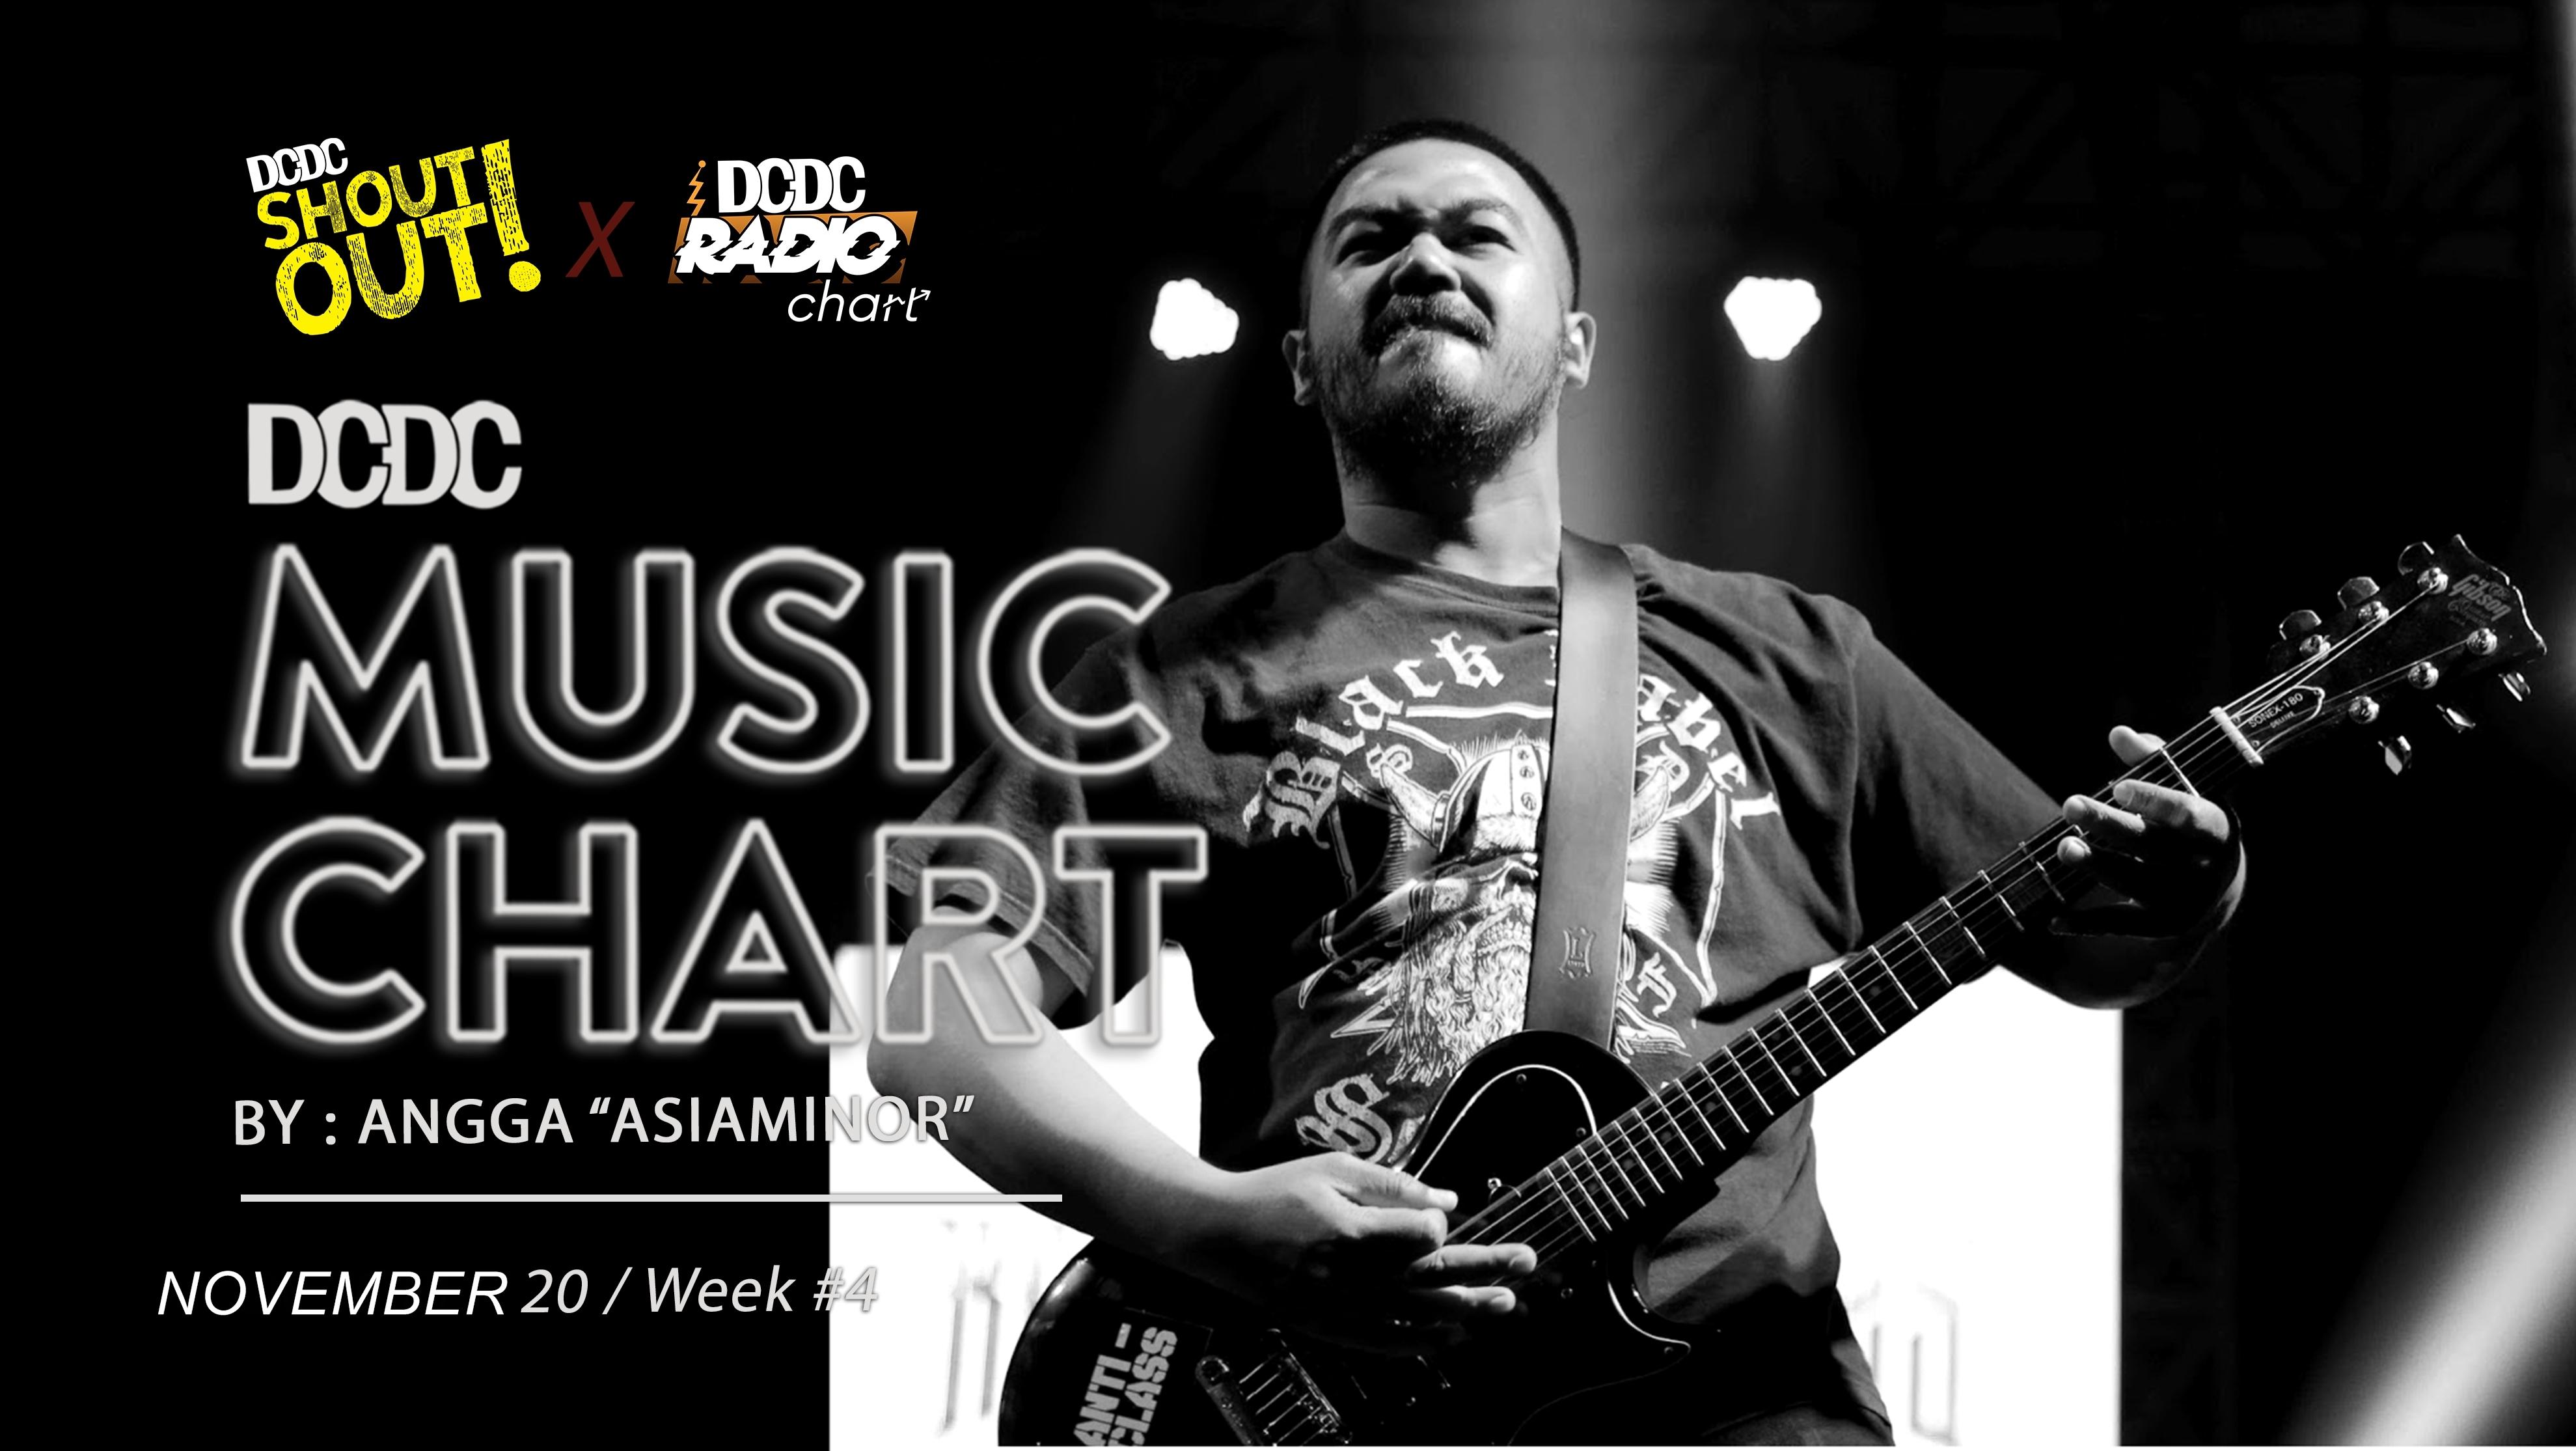 DCDC Music Chart - #4th Week of November 2020